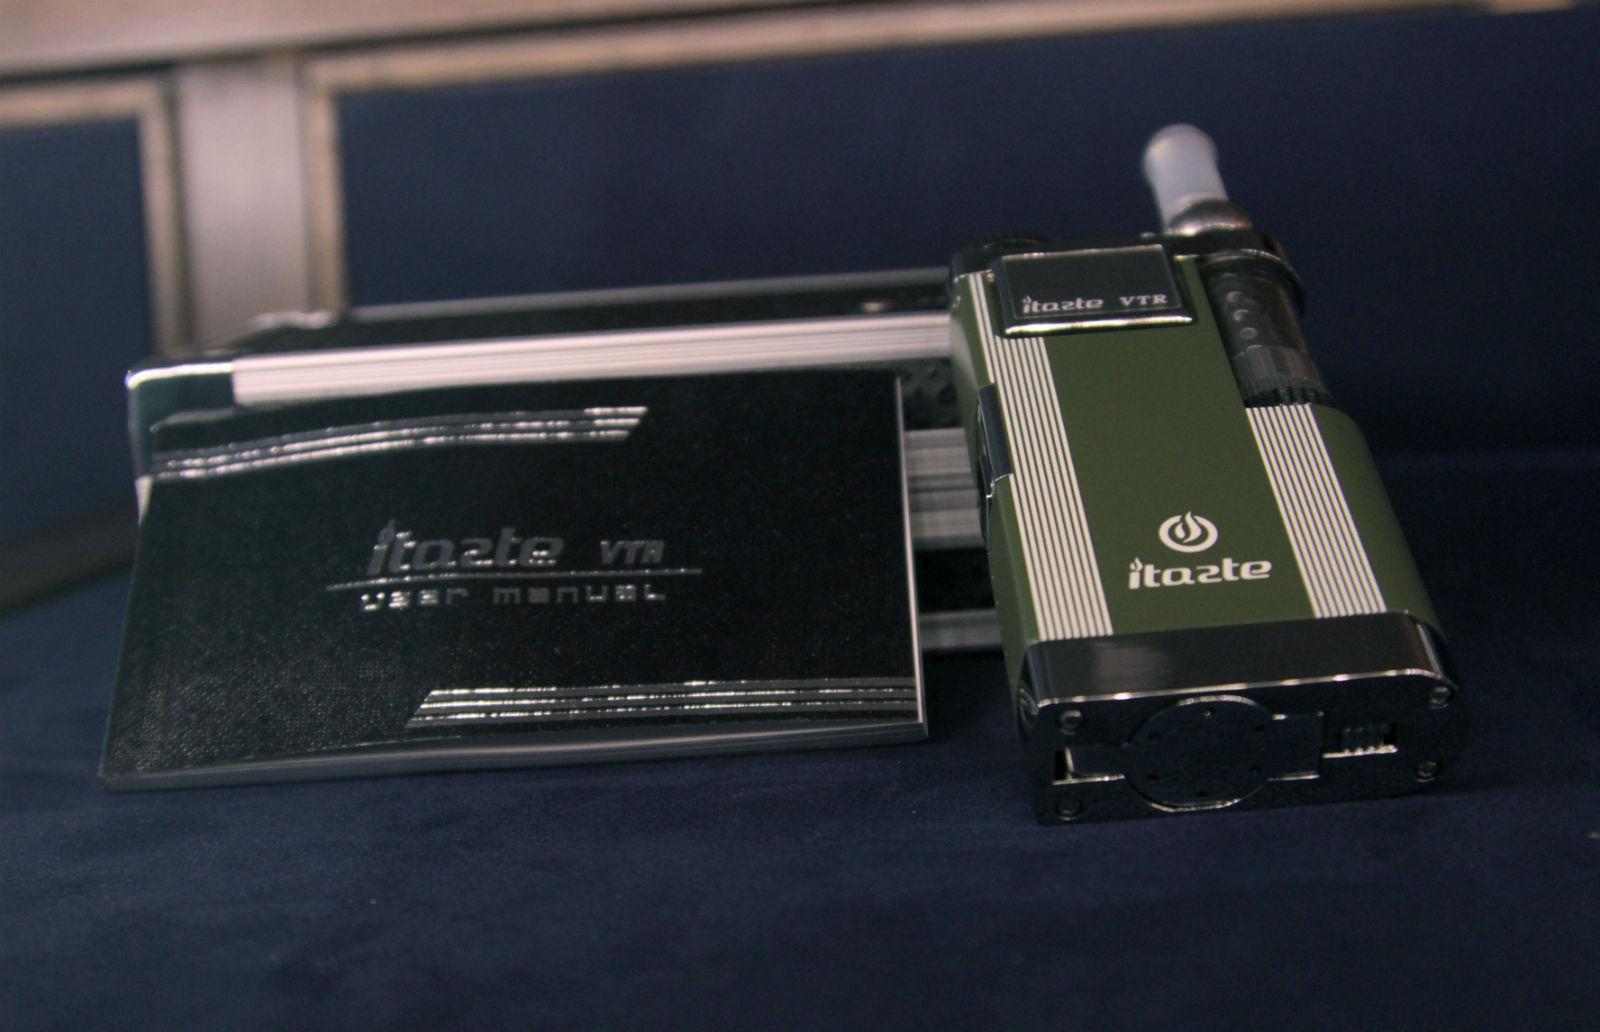 Hazy Regulations For E-Cigarettes on the Vapory Coast